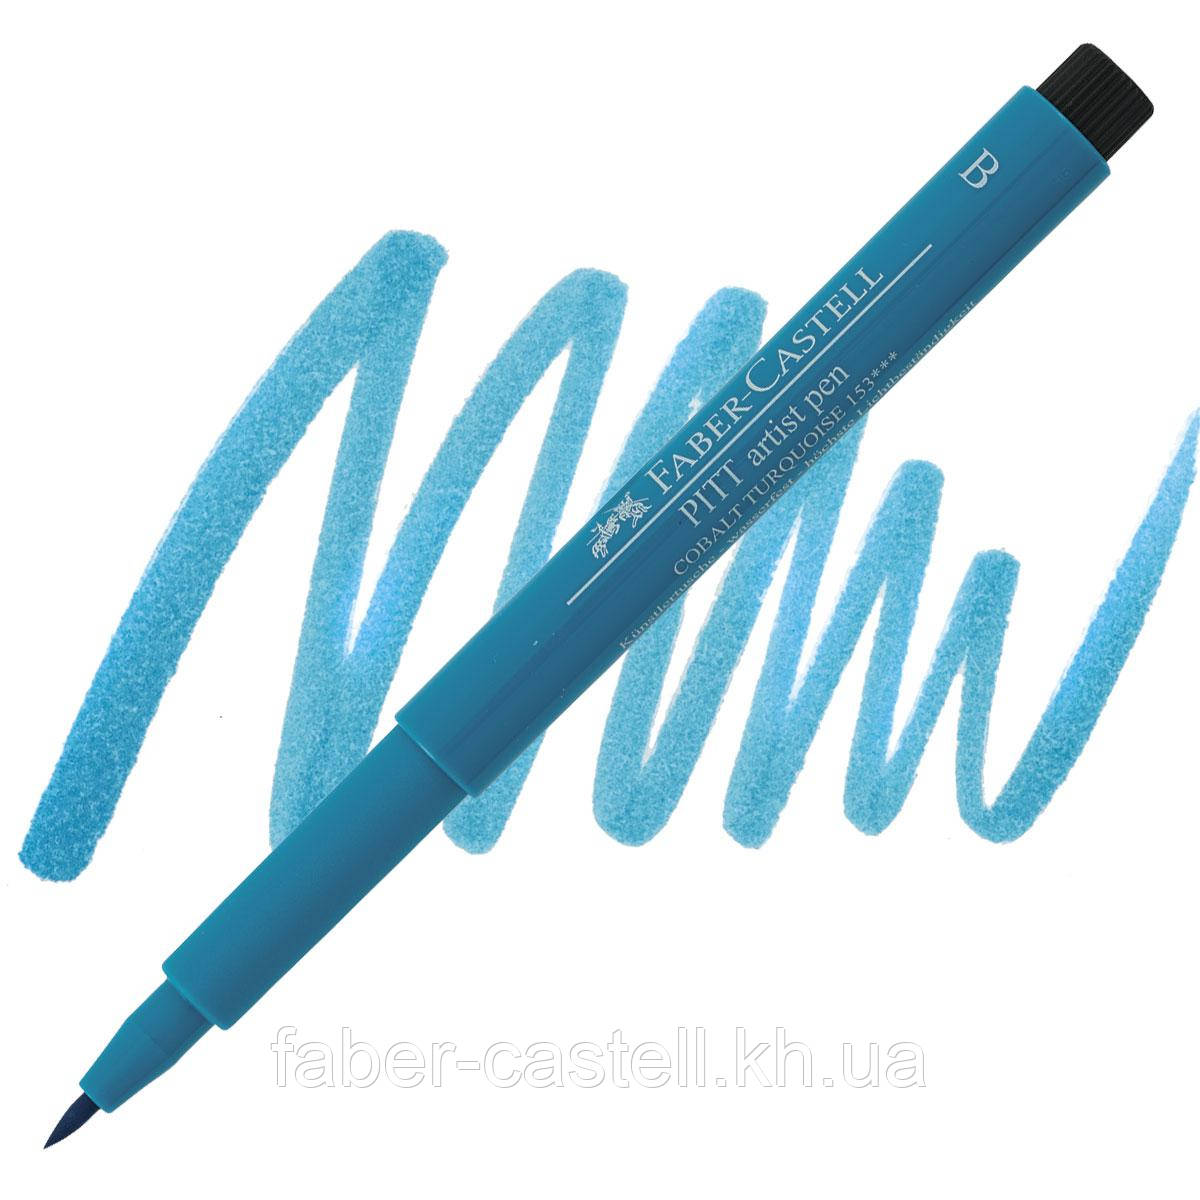 "Ручка-кисточка капиллярная Faber - Castell PITT® ARTIST PEN ""BRUSH"" №153 бирюзовый кобальт, 167453"